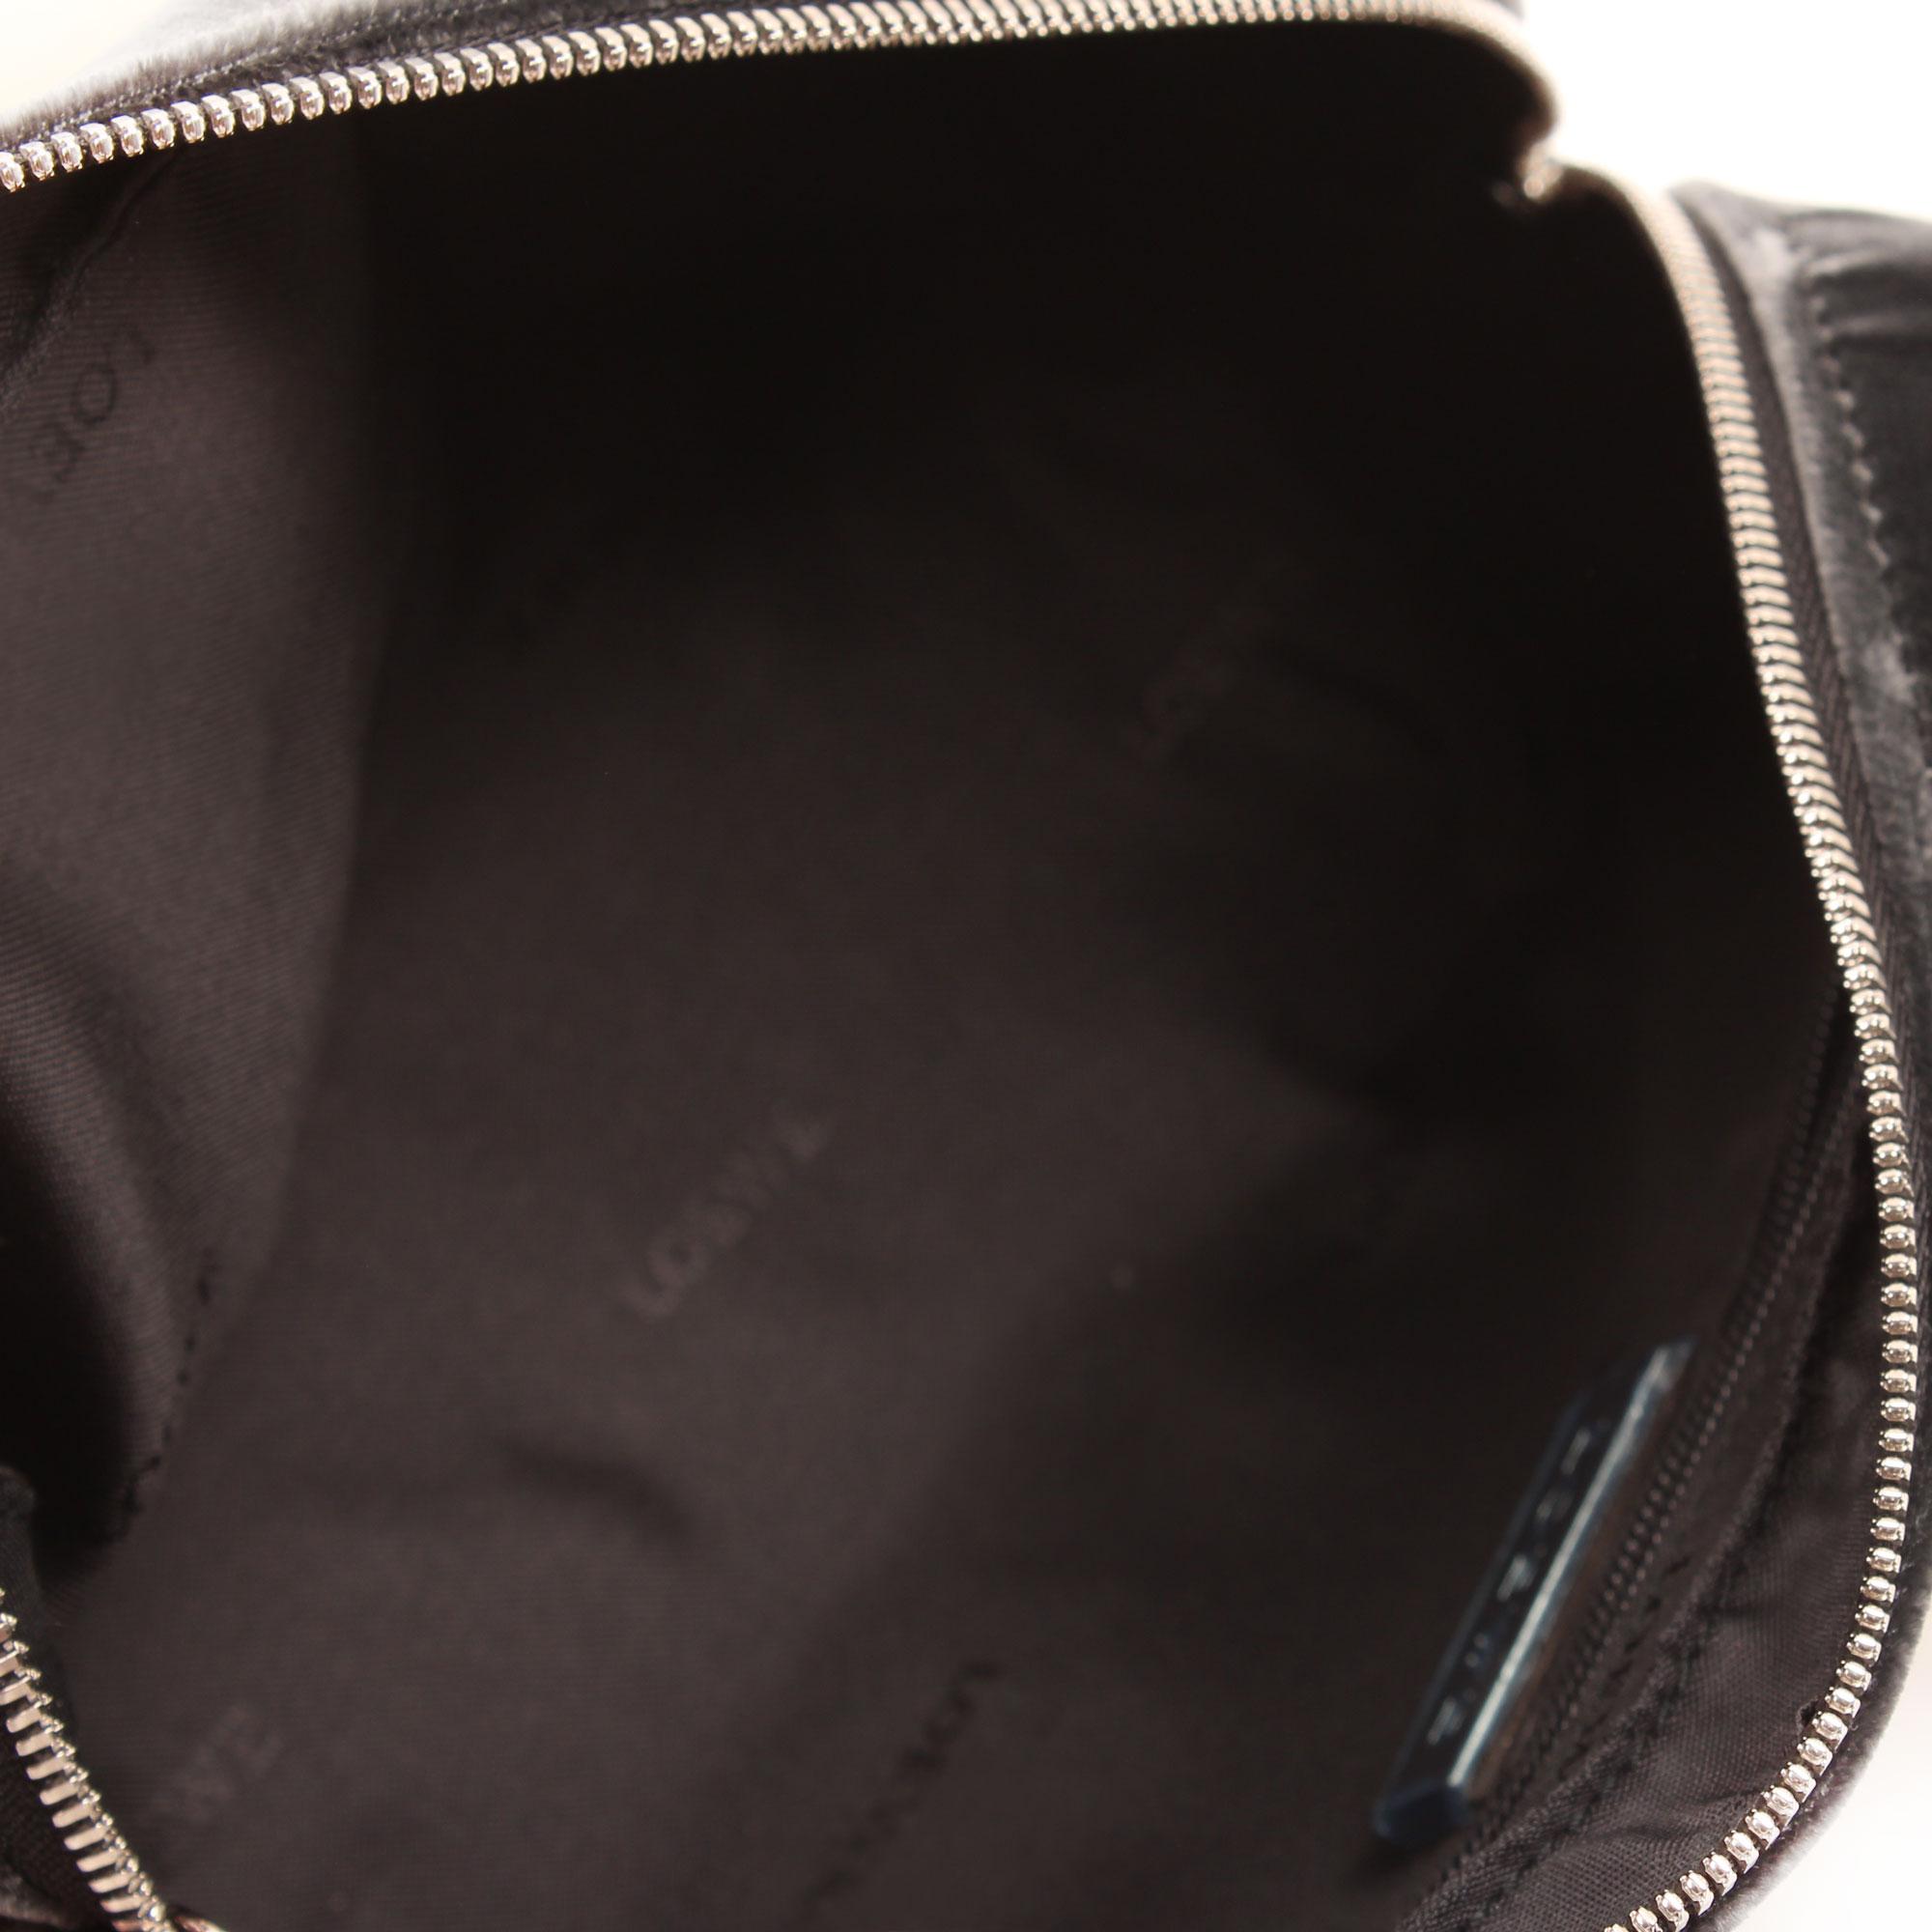 Imagen del interior del bolso loewe amazona bb negro terciopelo